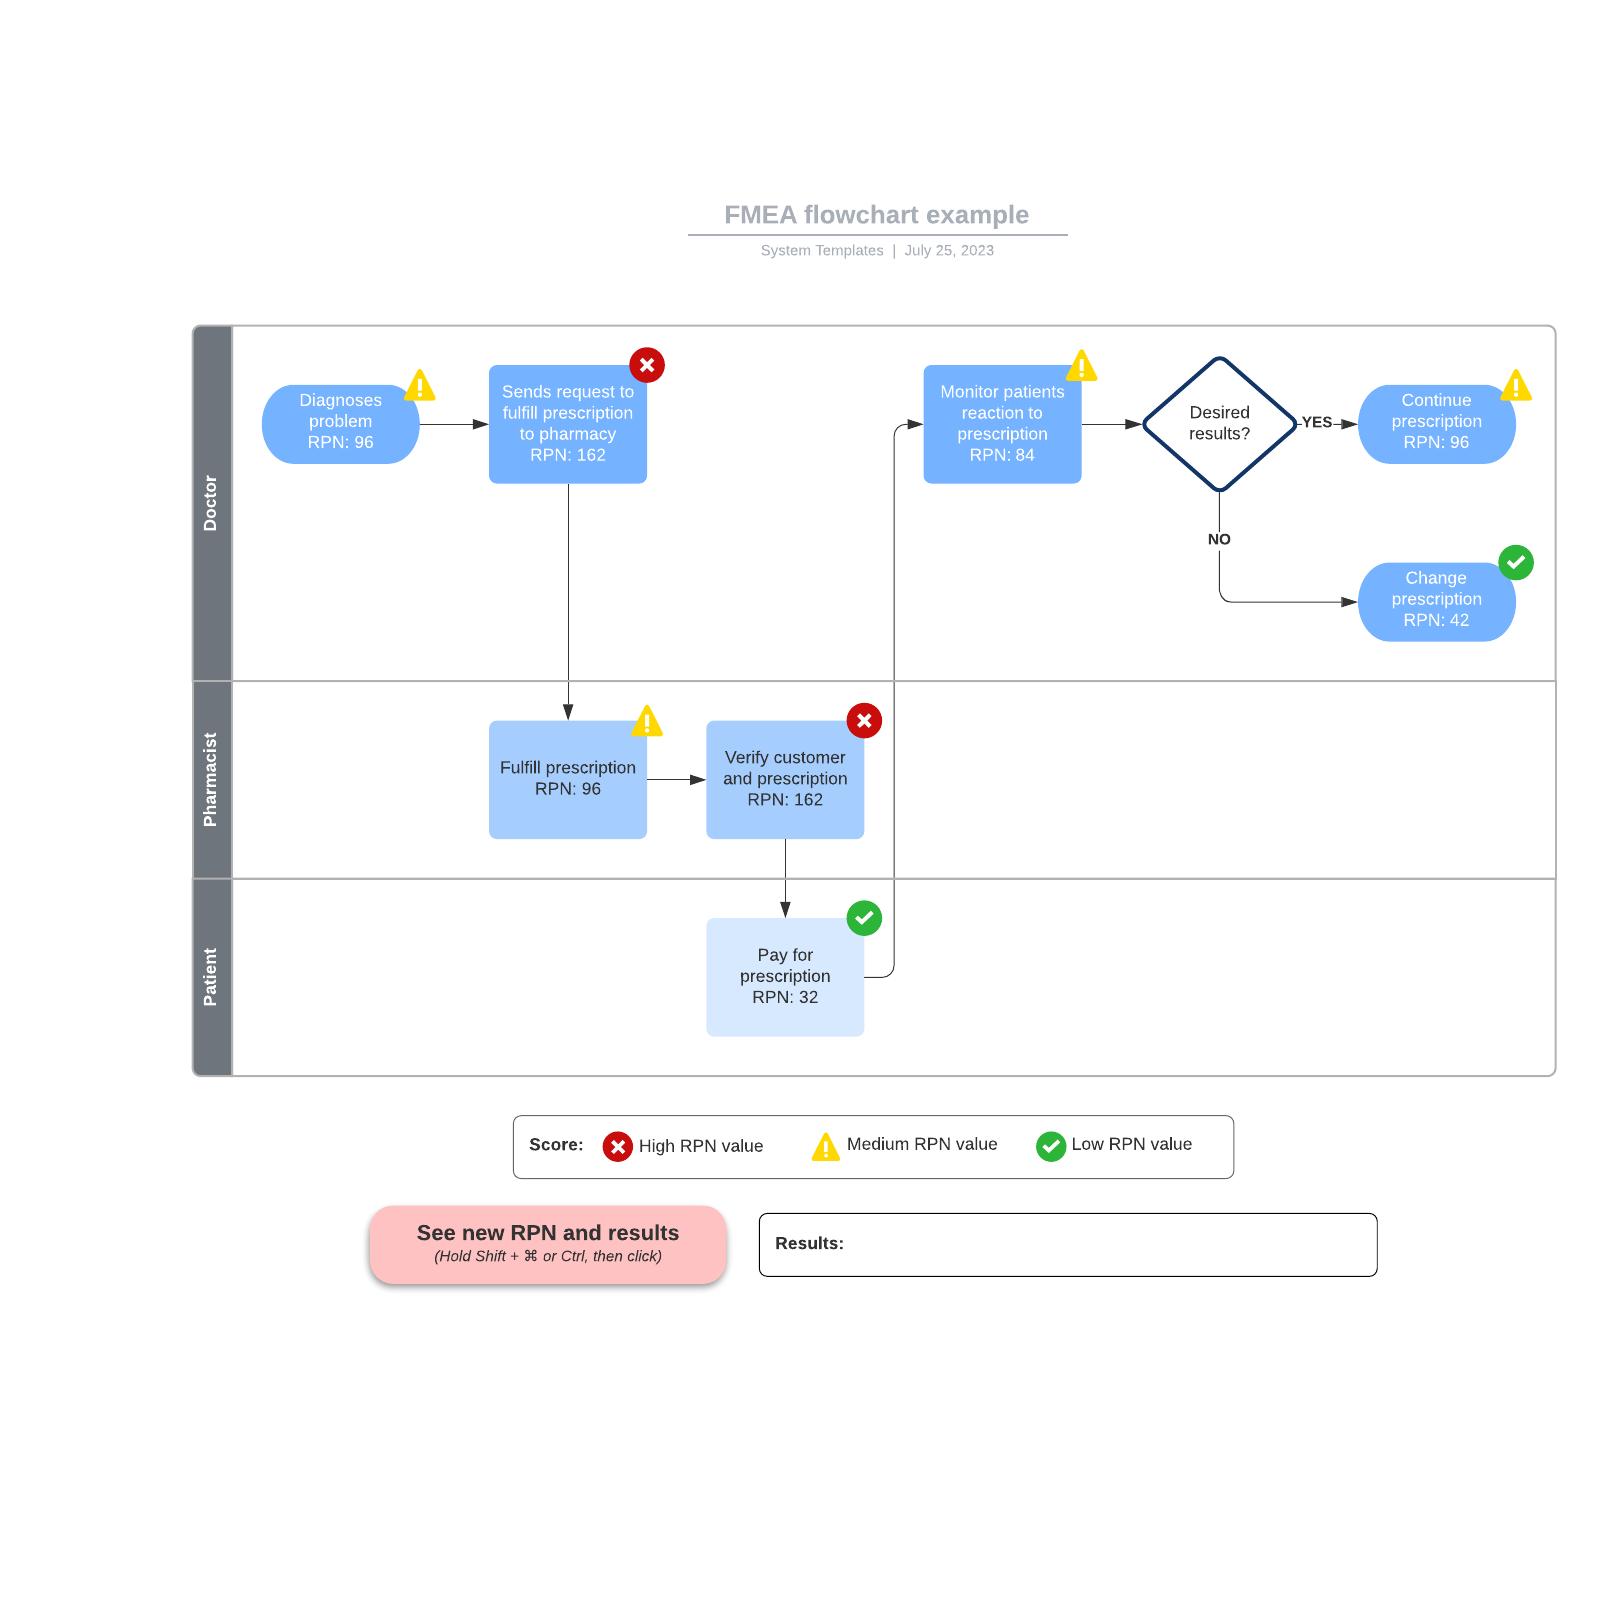 FMEA flowchart example